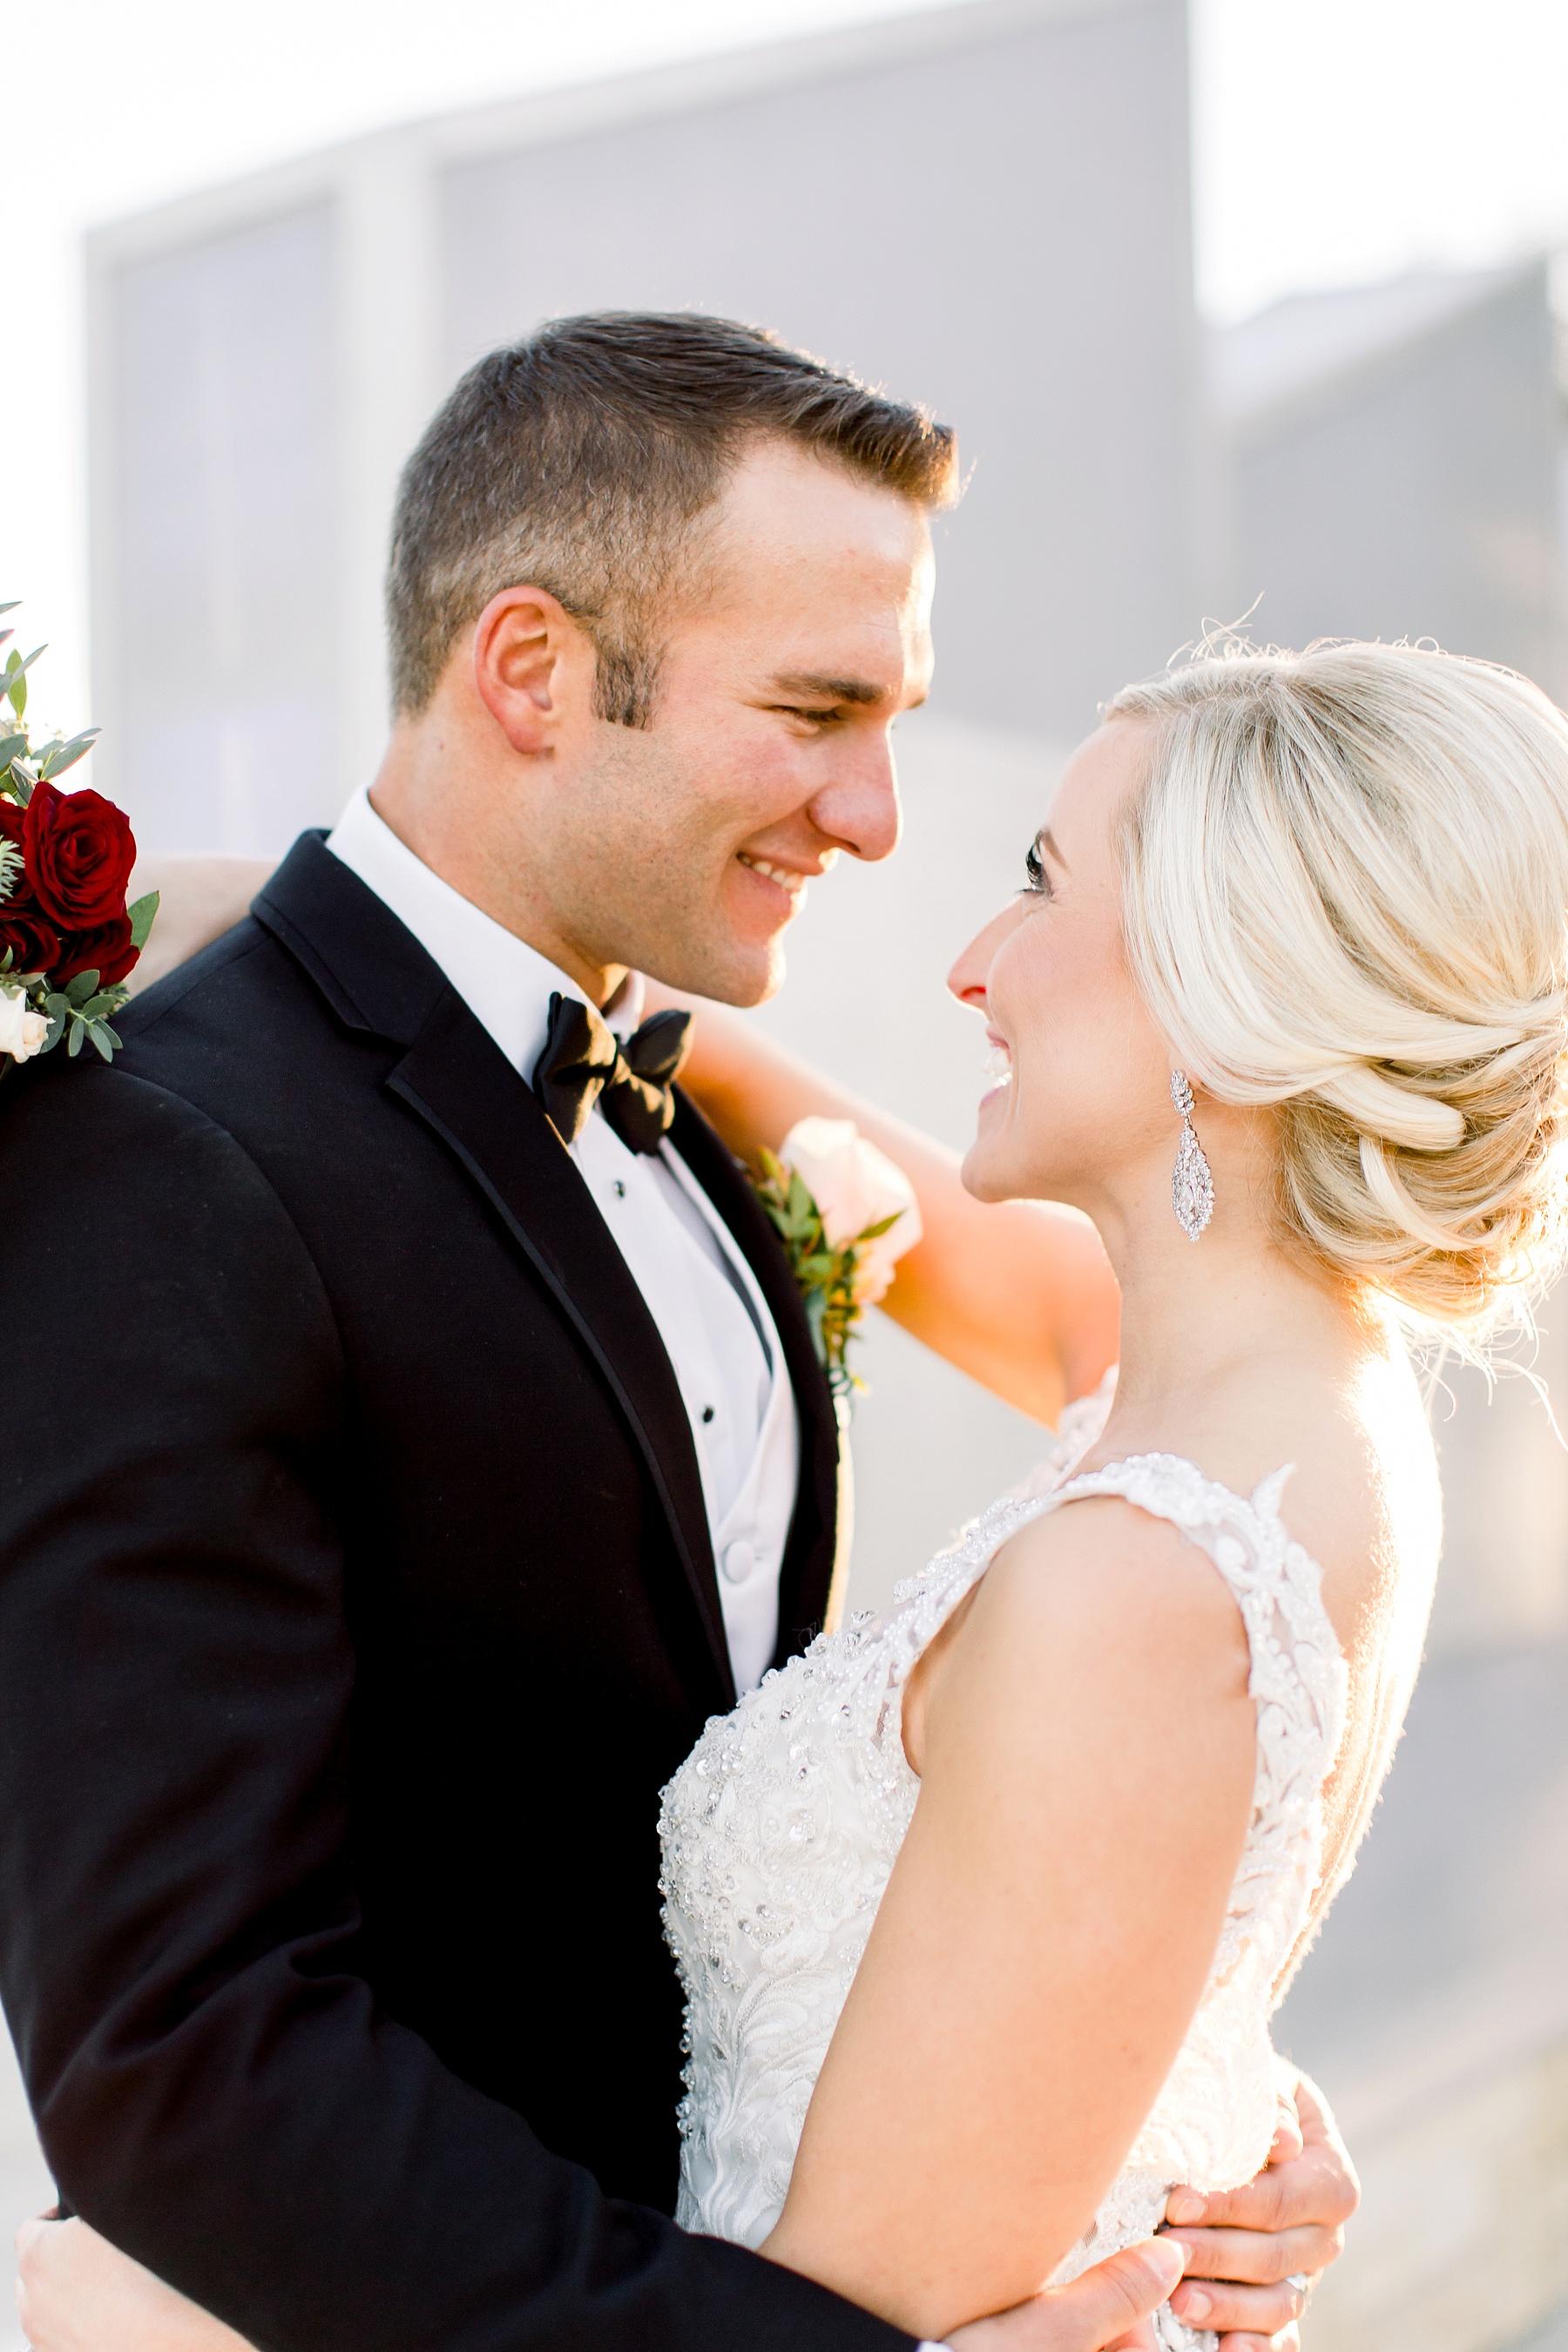 midwest-adventurous-wedding-photographer-elizabeth-ladean-photography-photo_4816.jpg